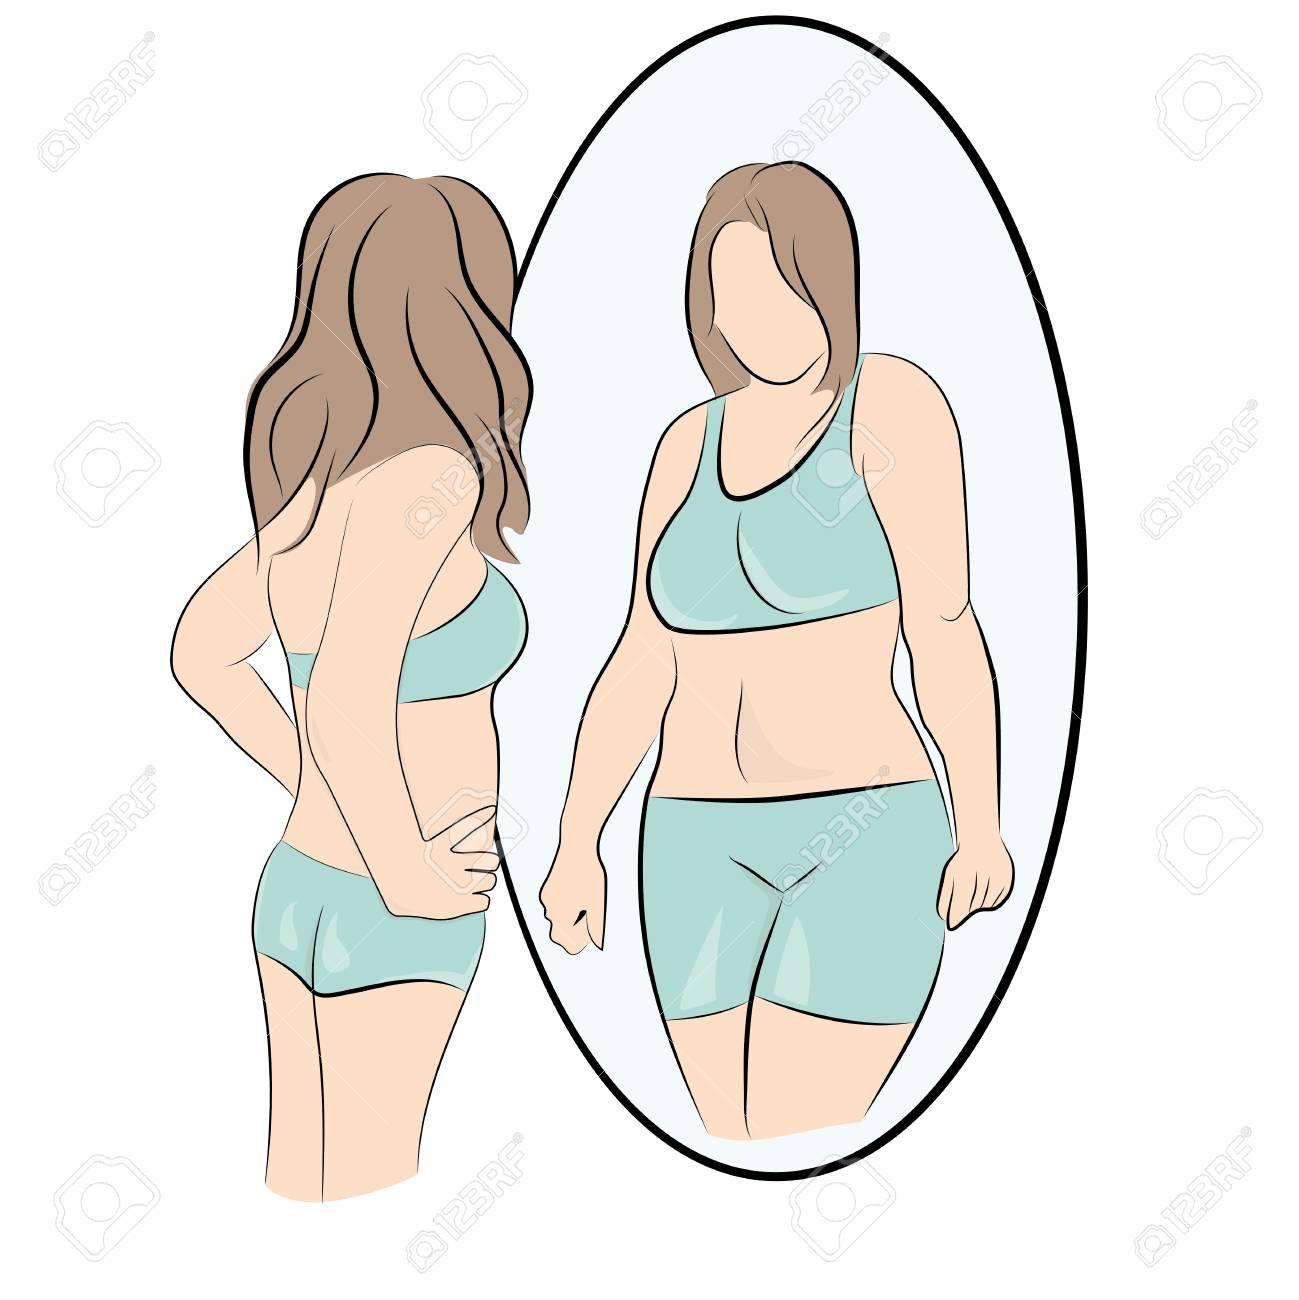 girl looks fat vector illustration. - 114159660